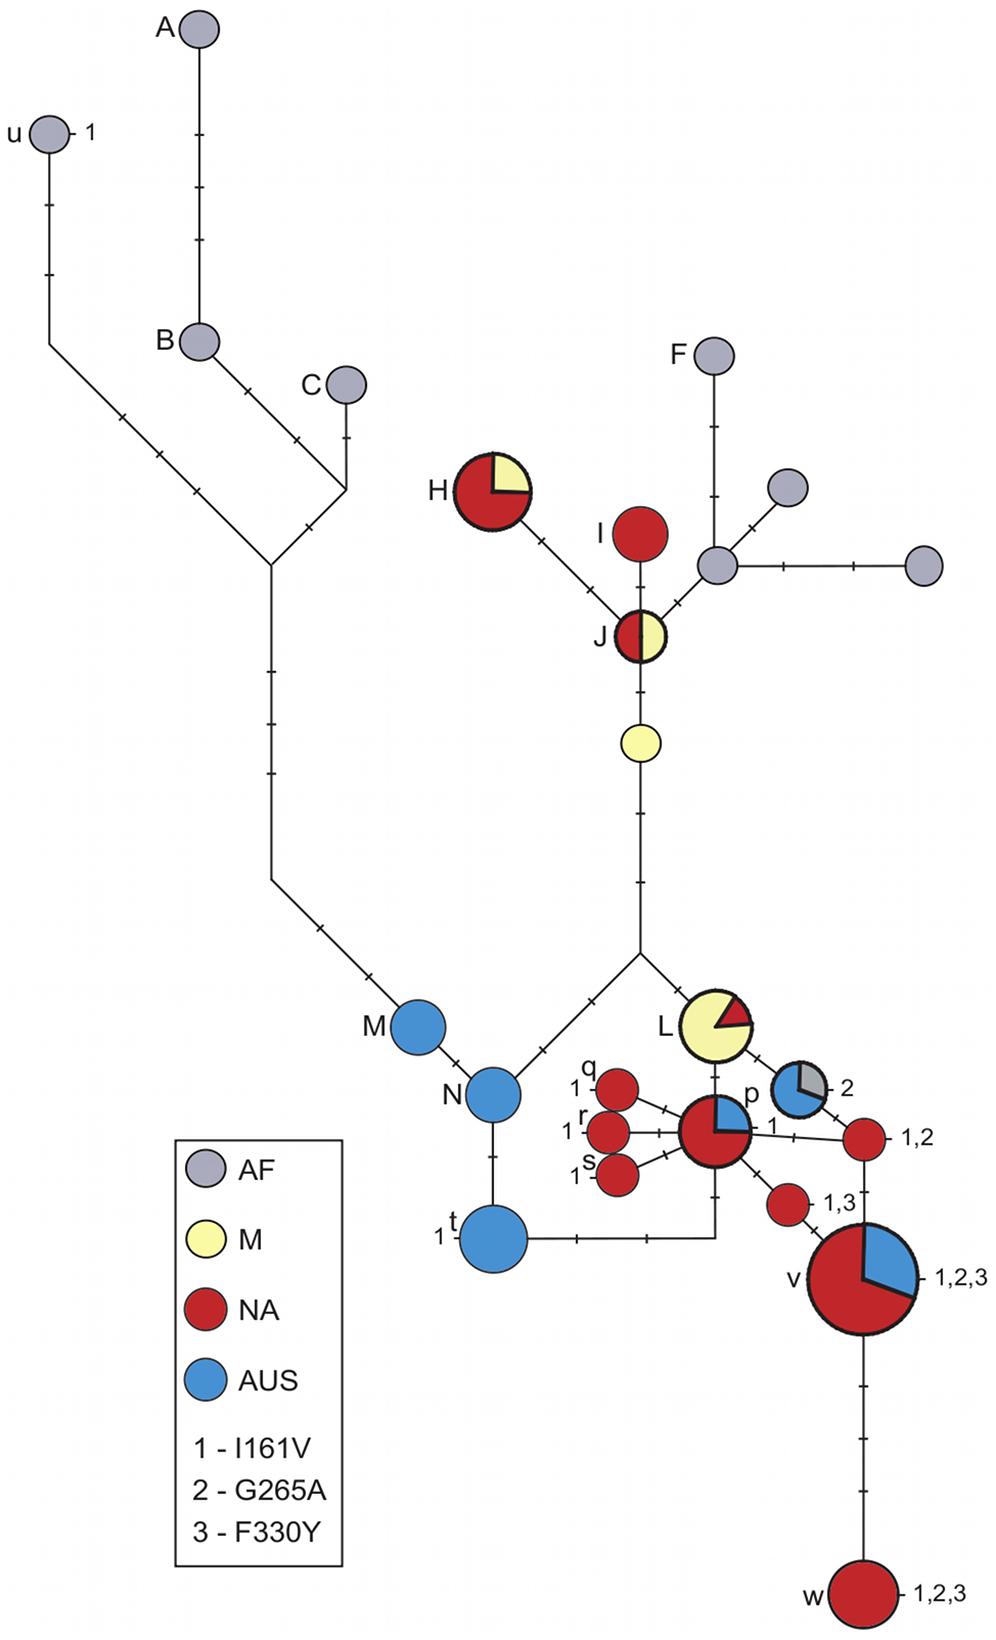 Haplotype network at <i>Ace</i>.